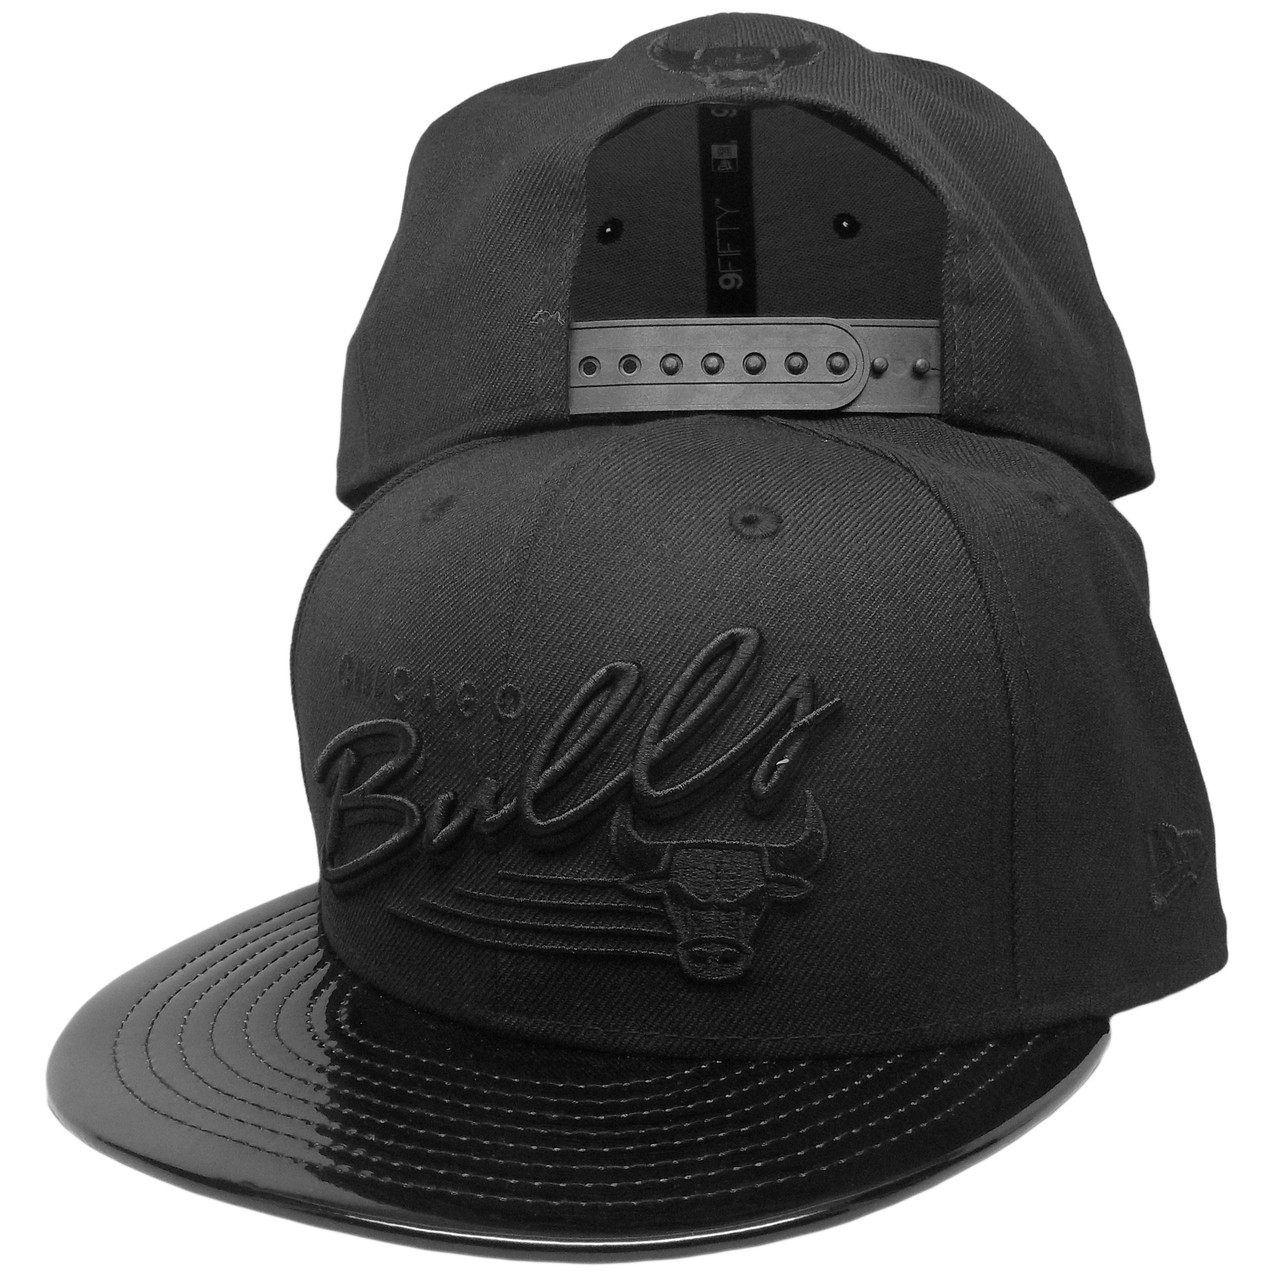 Chicago Bulls New Era Custom 9Fifty Snapback Hat - Black 3481bd65761